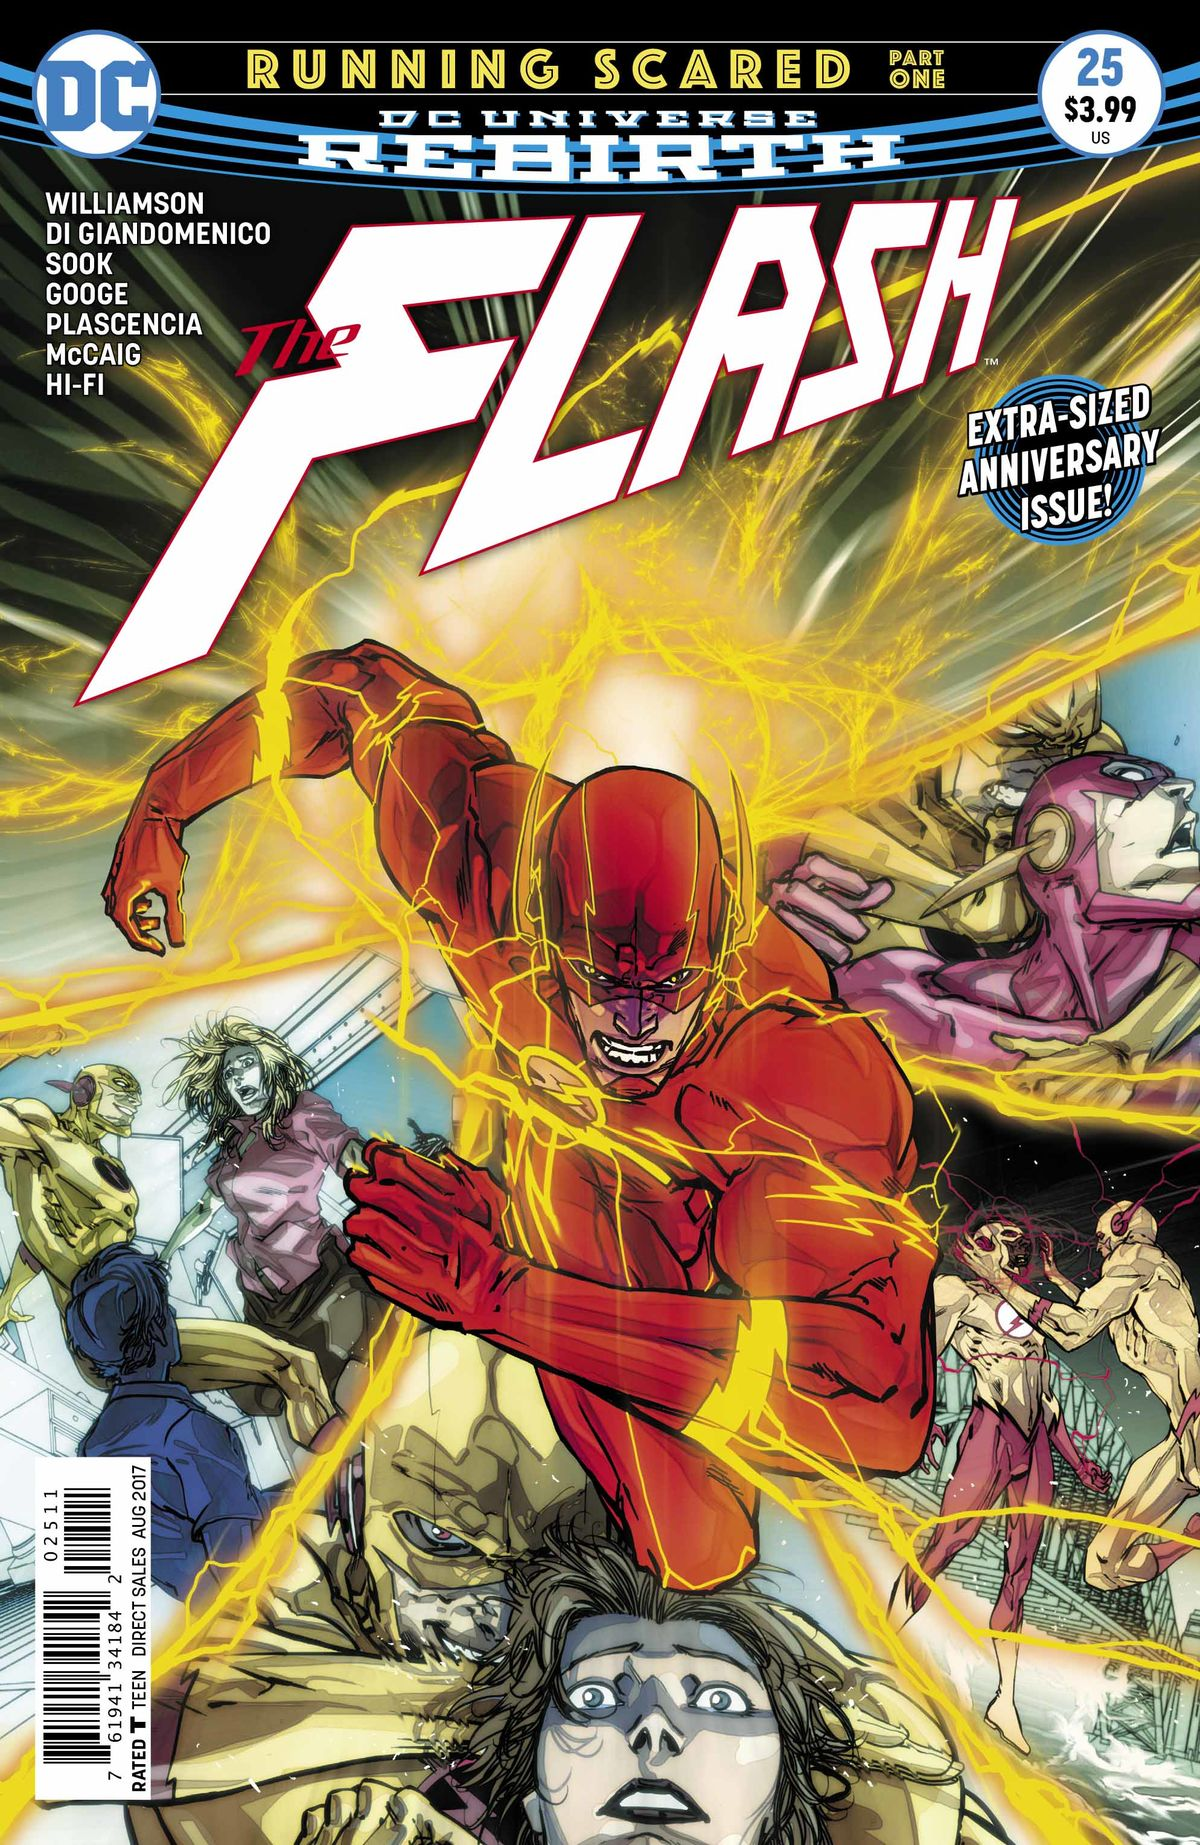 DC Comics' The Flash: Reverse-Flash aims to kill Barry's